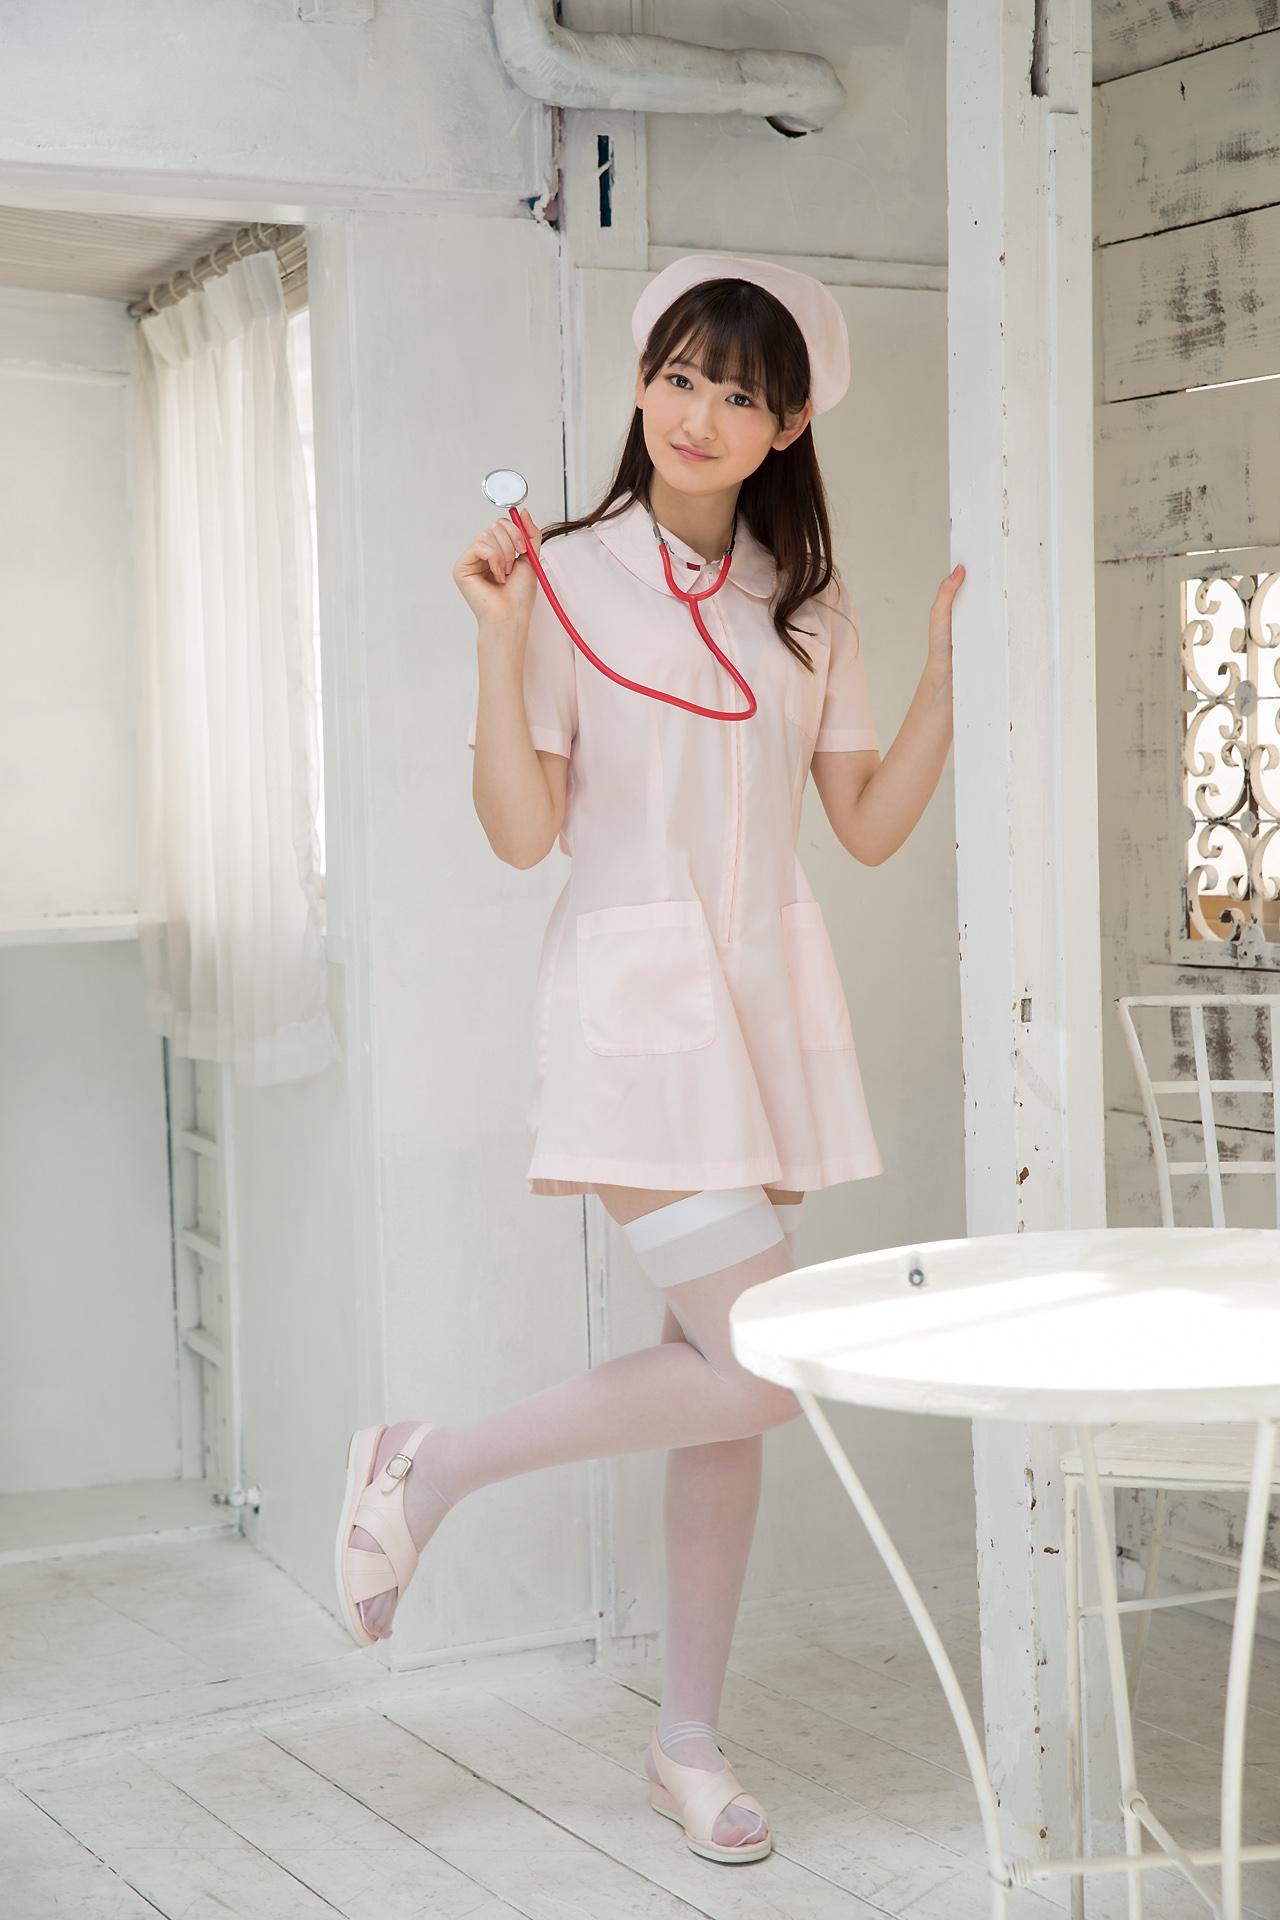 Asami Kondou 近藤あさみ [Minisuka.tv] Limited Gallery 16.2 - 亞洲美女 -